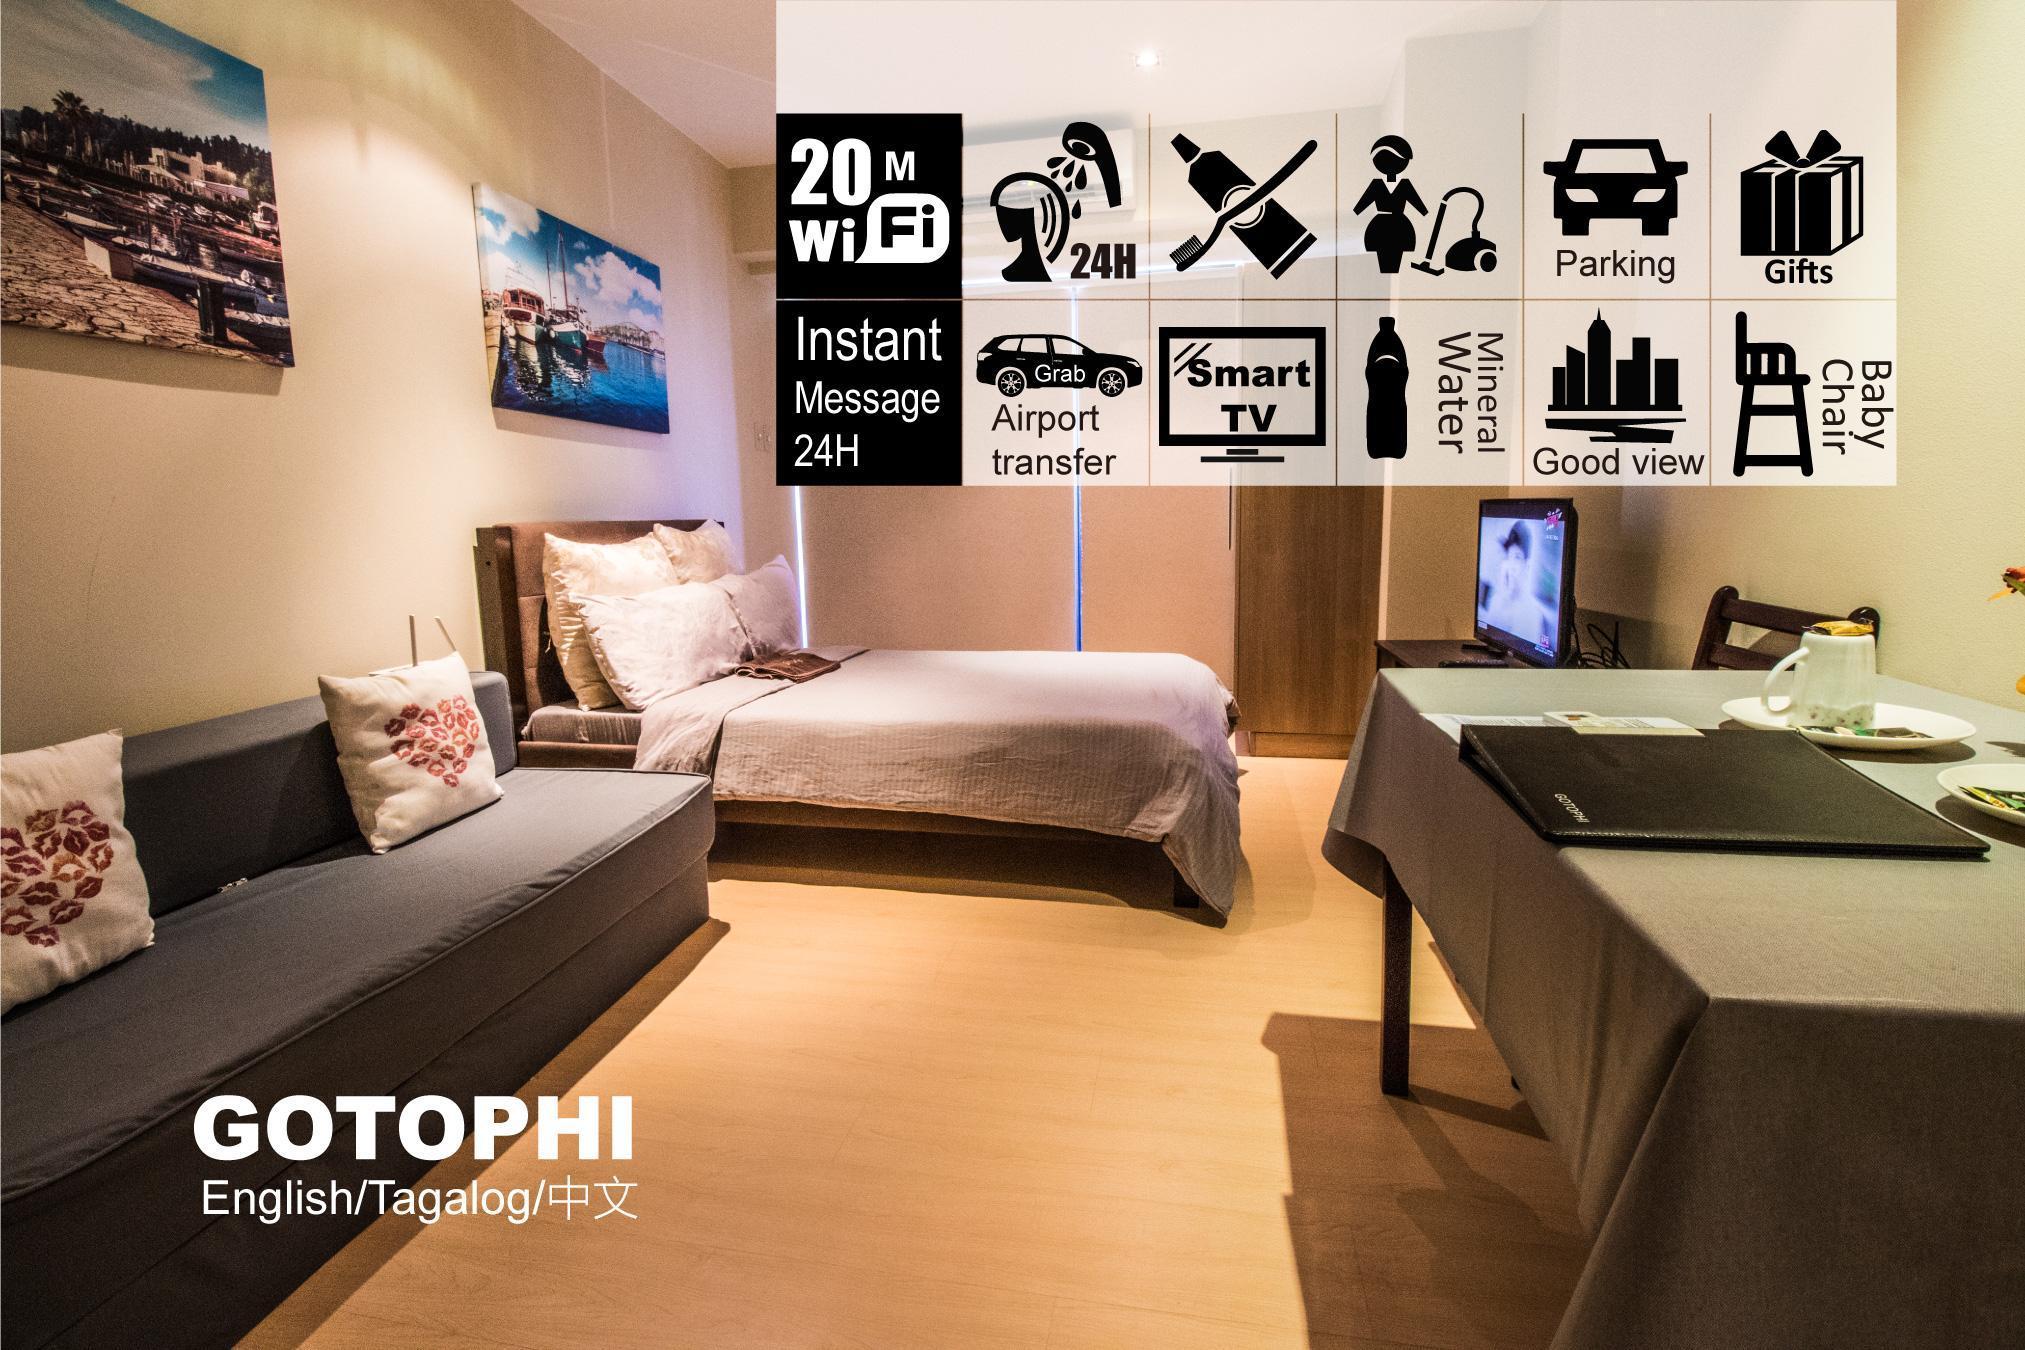 Gotophi luxurious hotel Knightsbridge Makati 5416